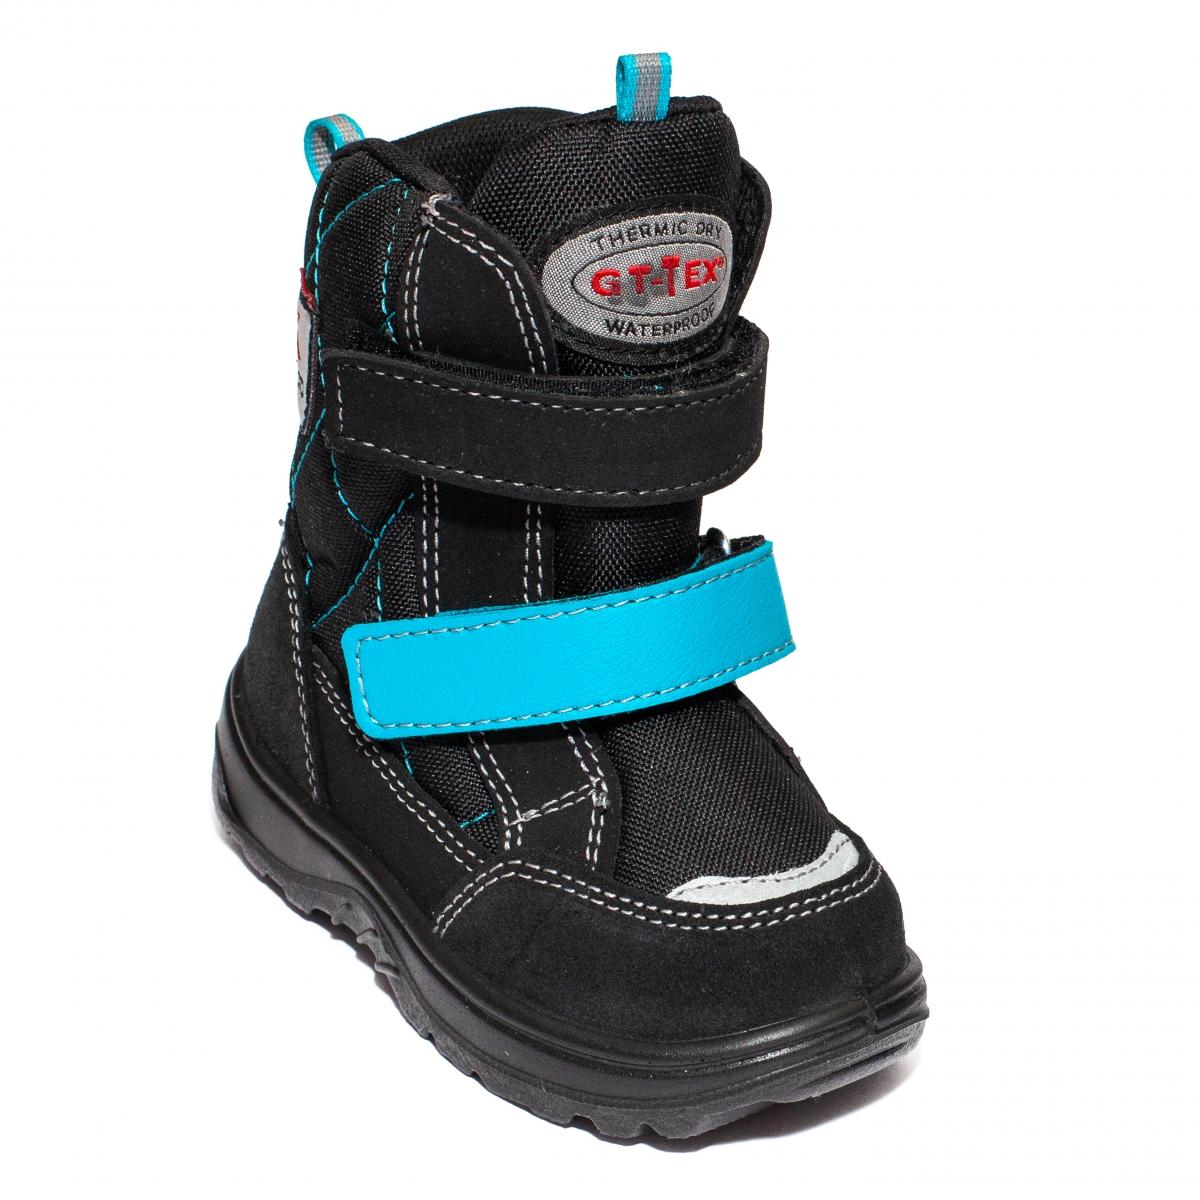 Ghete impermeabile copii blana GT tex 93311 negru turcoaz 20-25